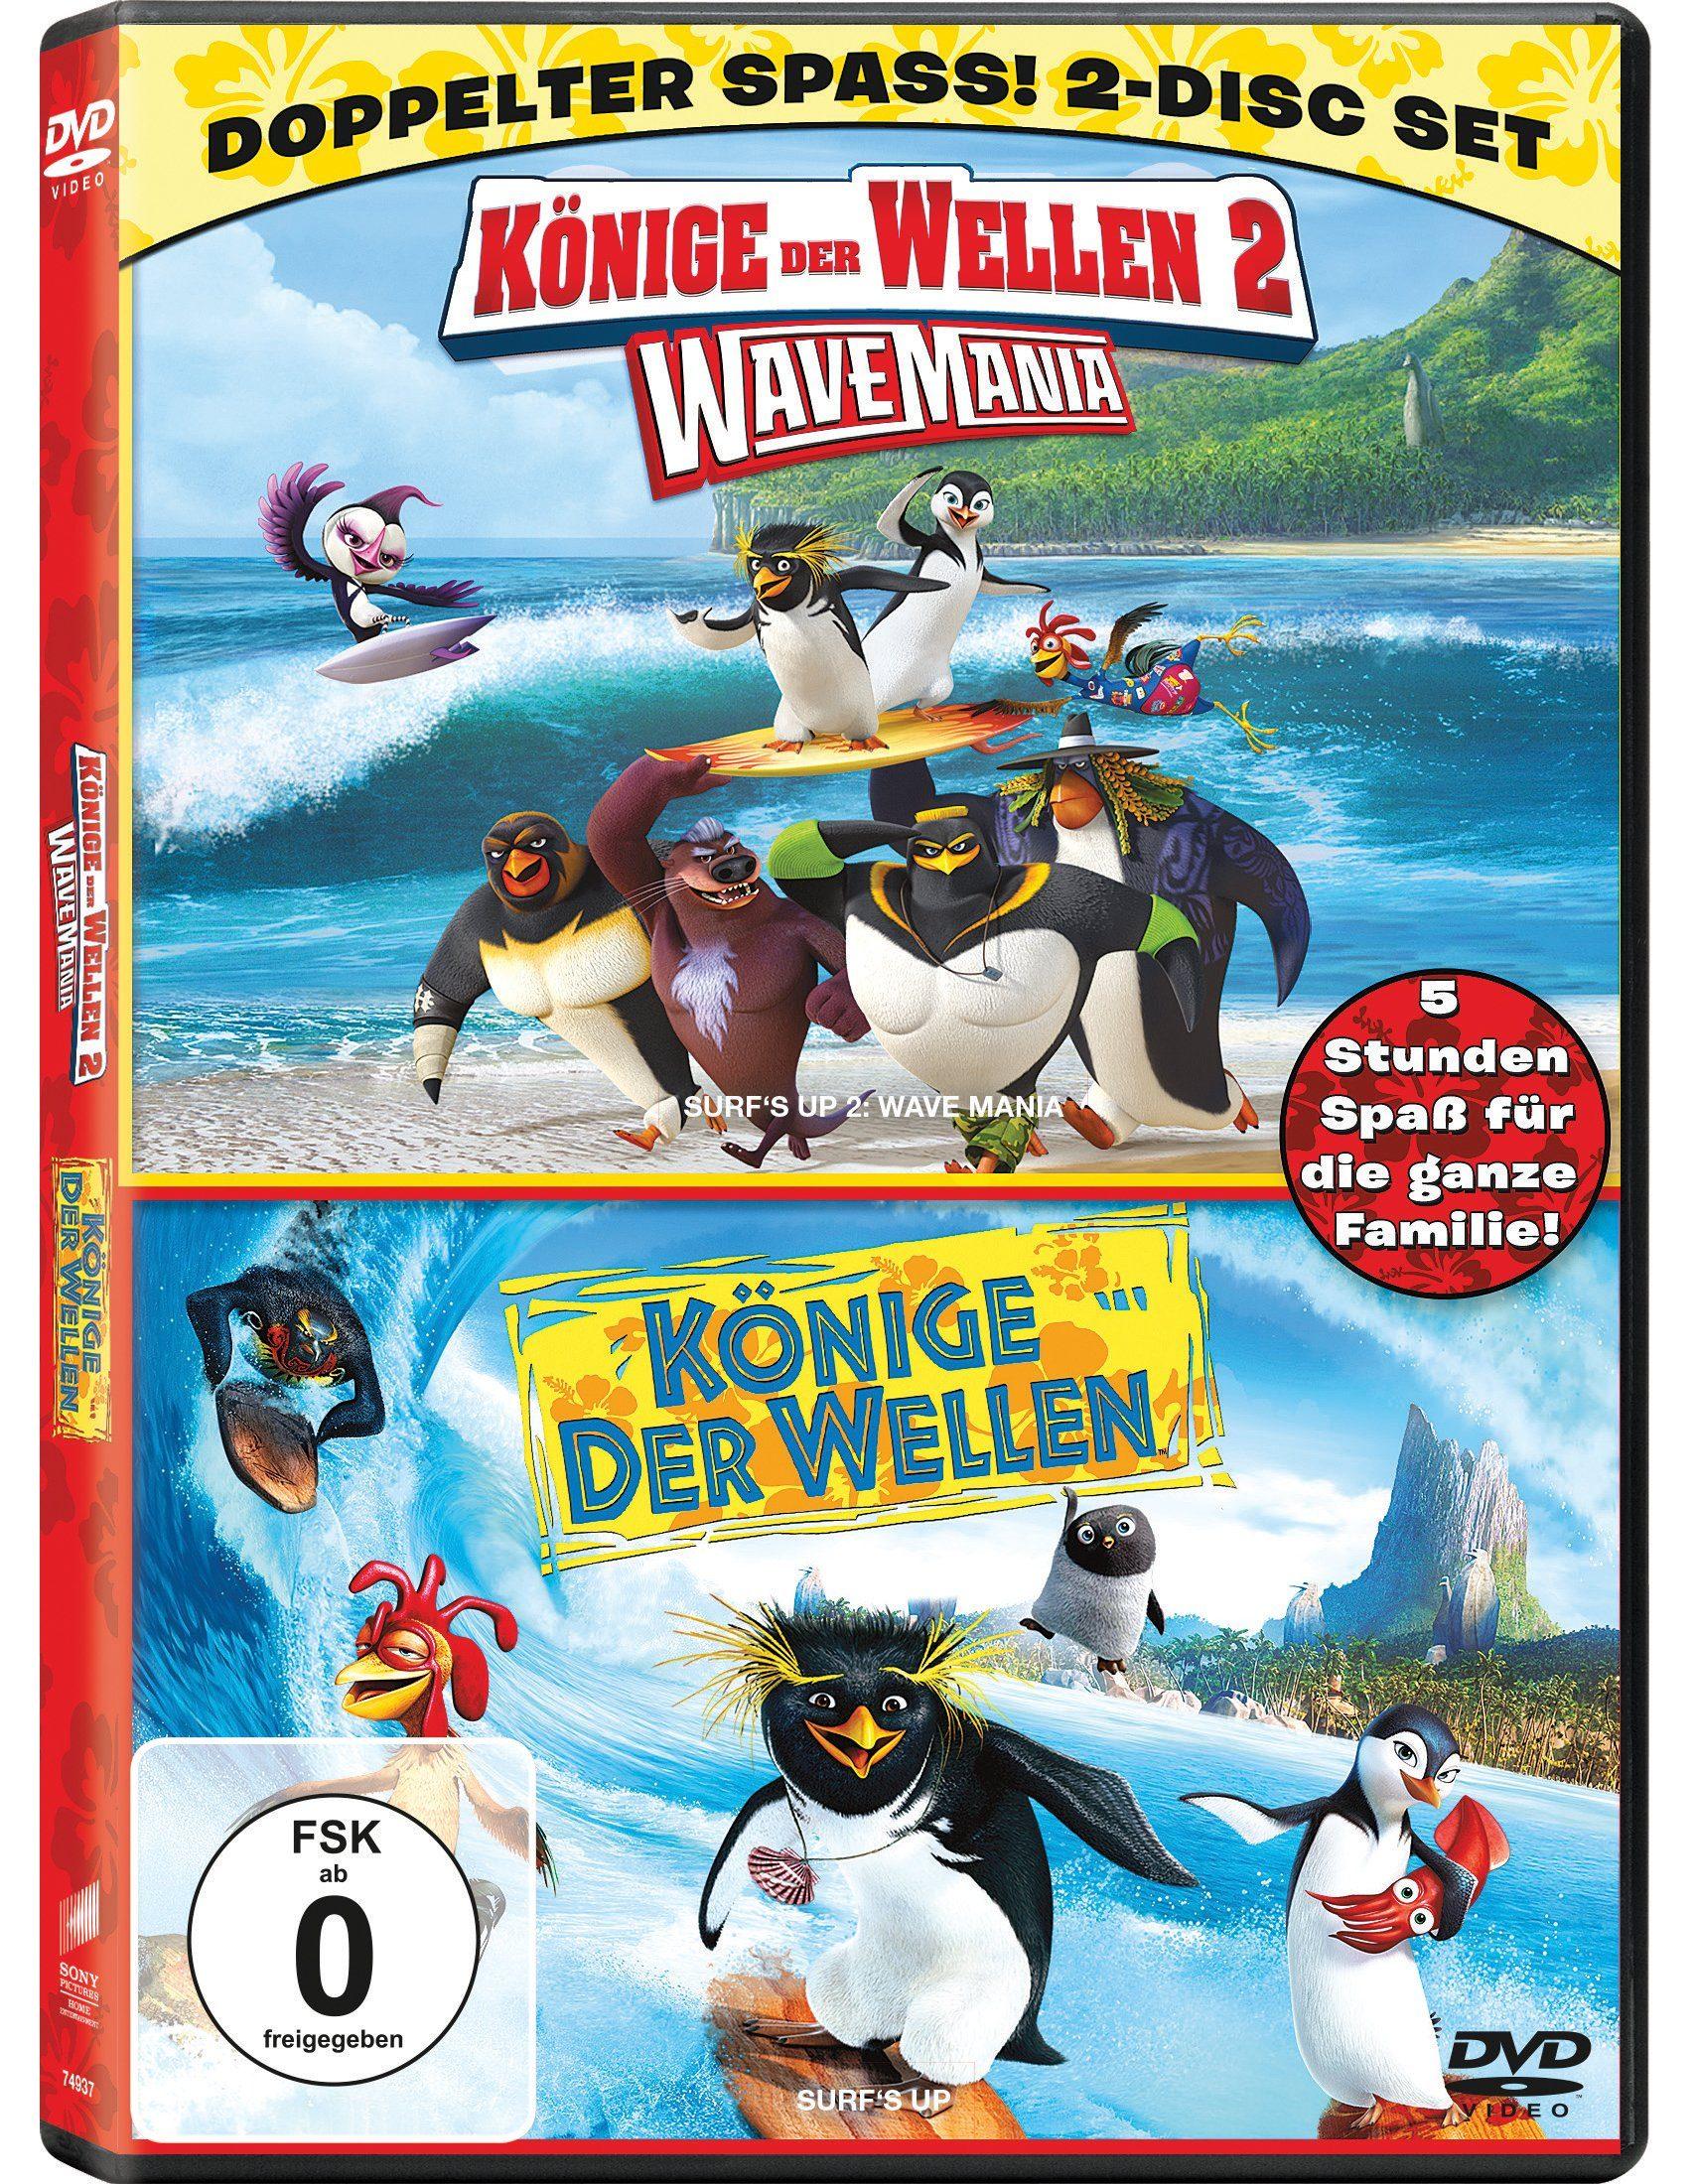 Sony Pictures DVD »Könige der Wellen 1 + 2«